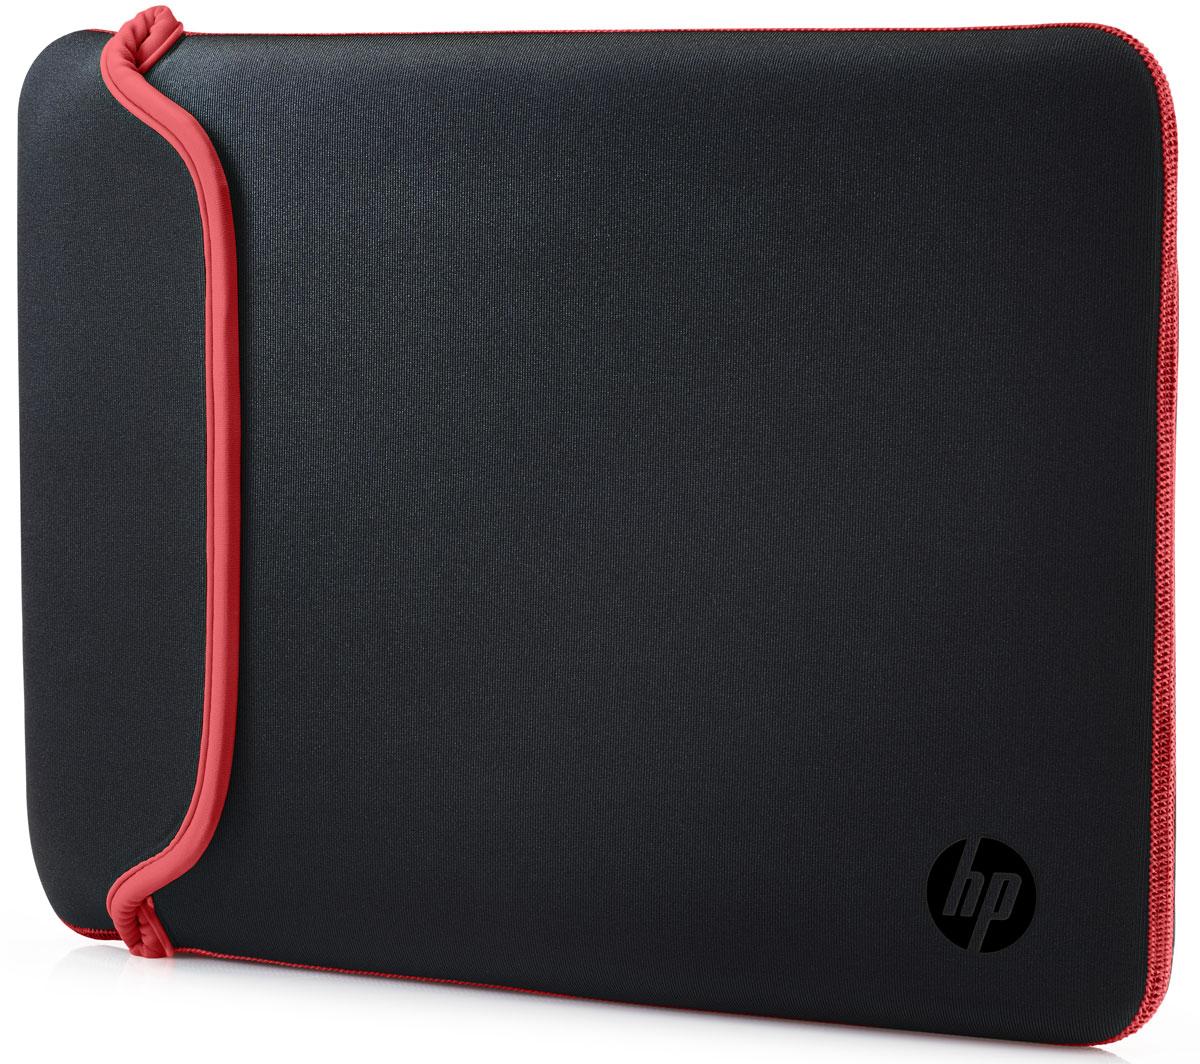 "HP Neoprene Sleeve чехол для ноутбука 14"", Black Red (V5C26AA)"